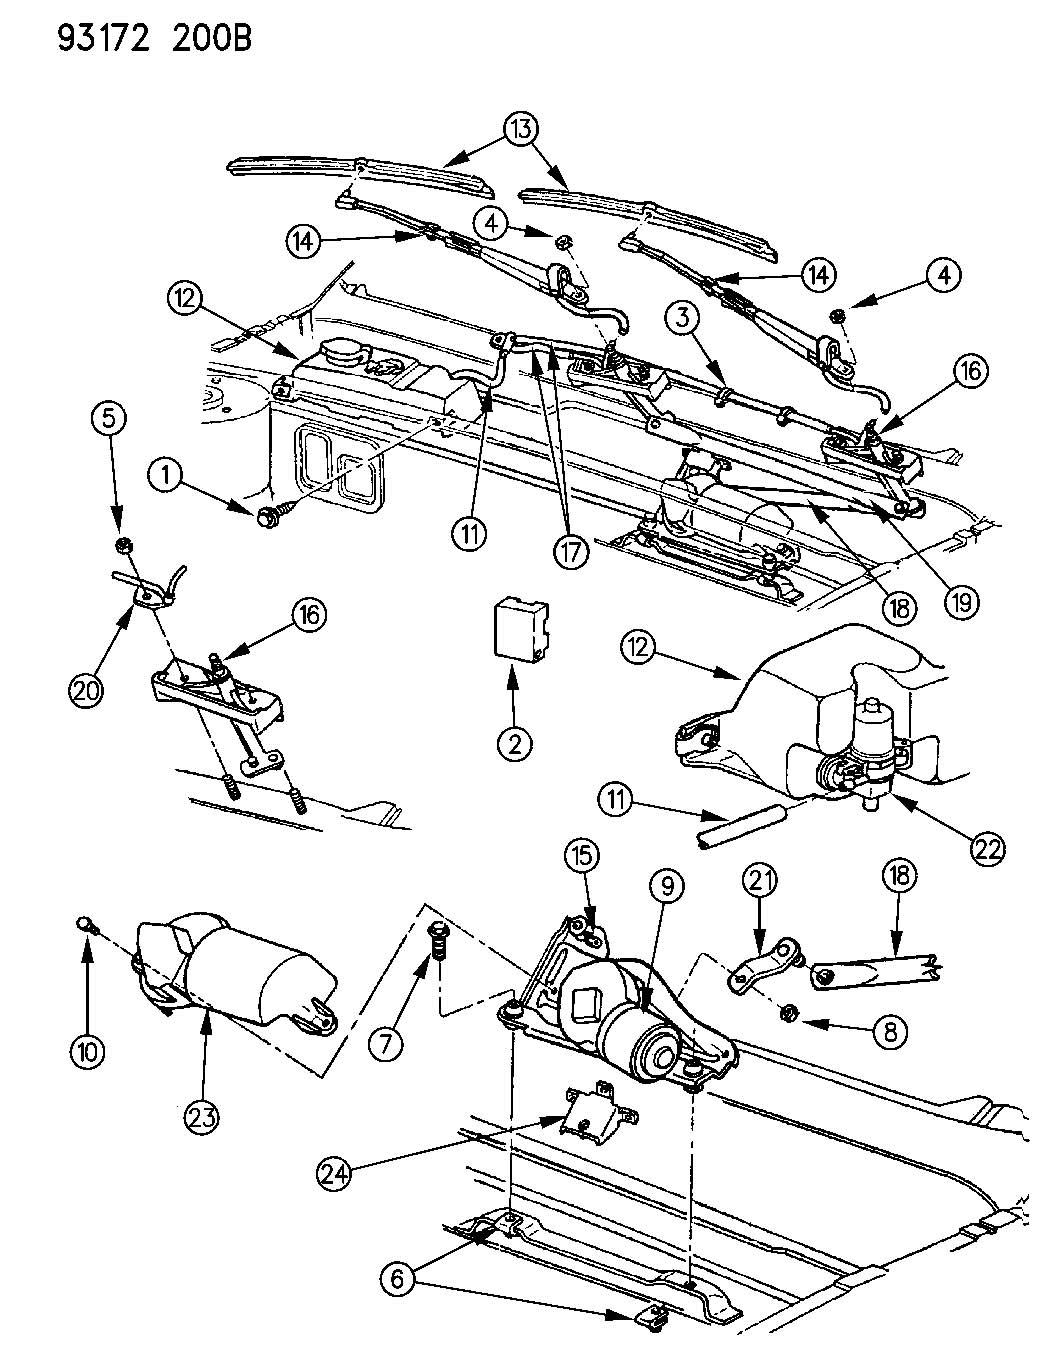 Chrysler Sebring Nut. Wiper arm. Hex flange (m8x1.25